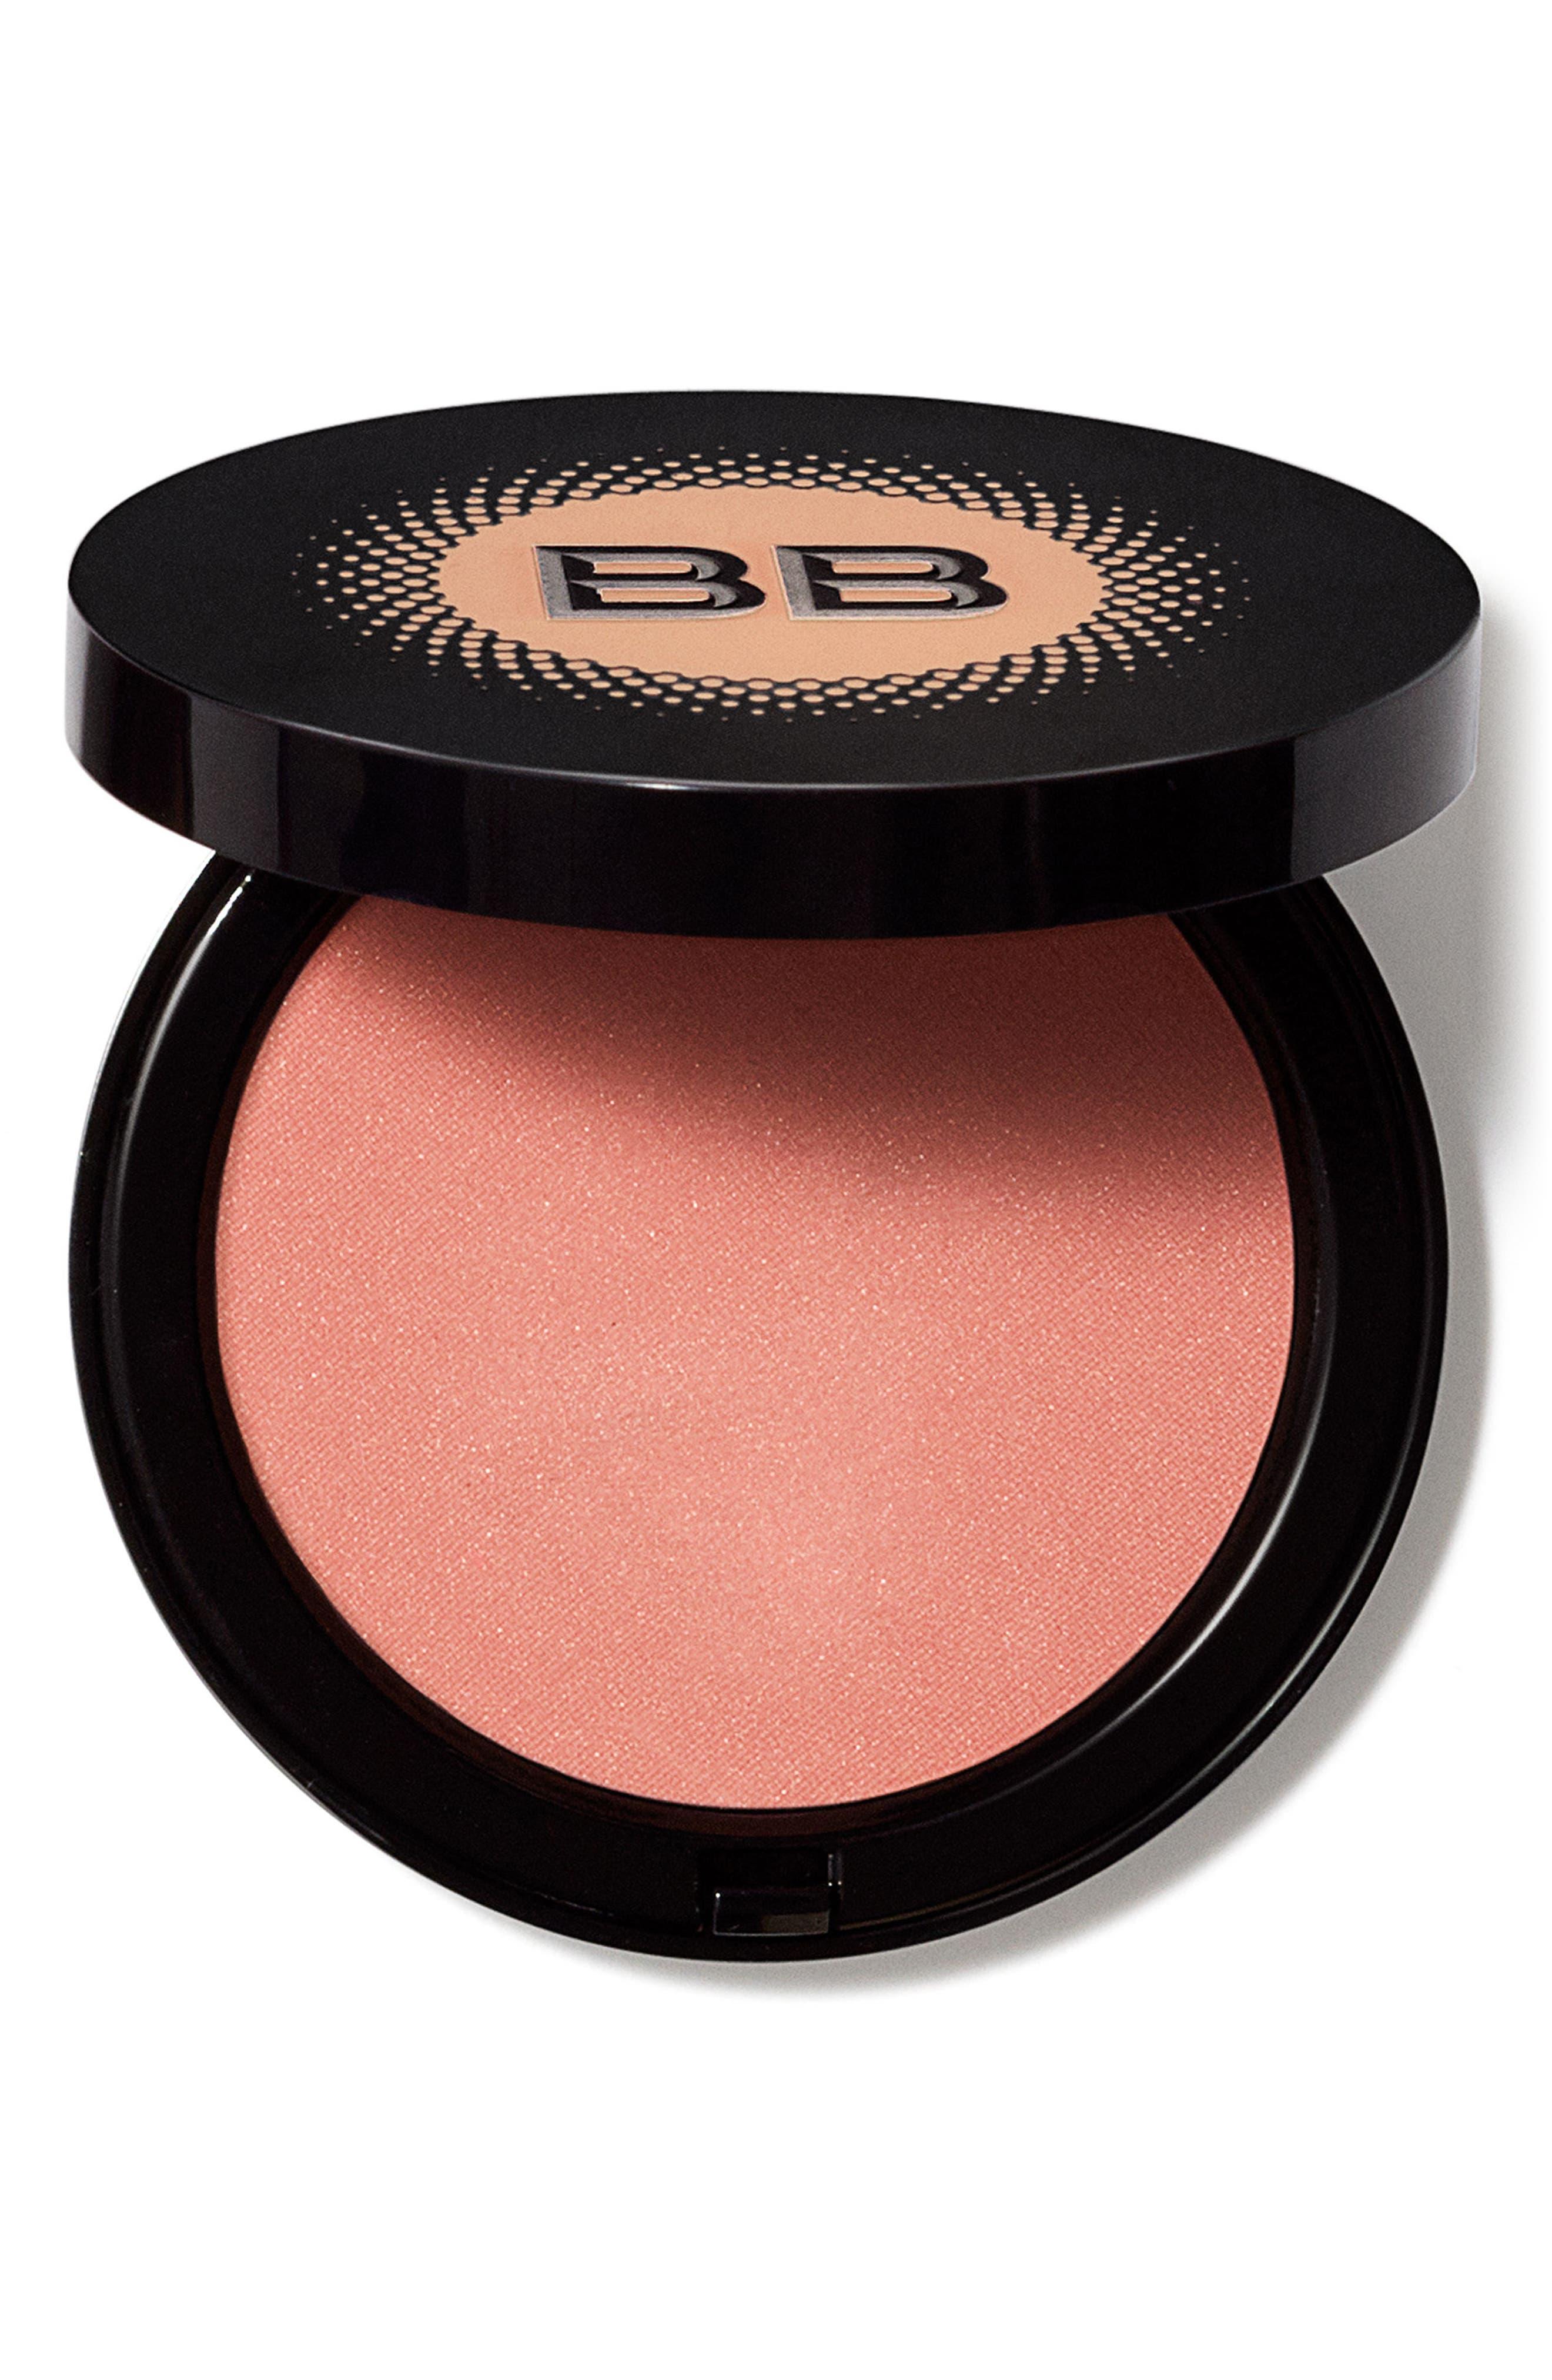 Bobbi Brown Illuminating Powder Bronzer (Limited Edition)